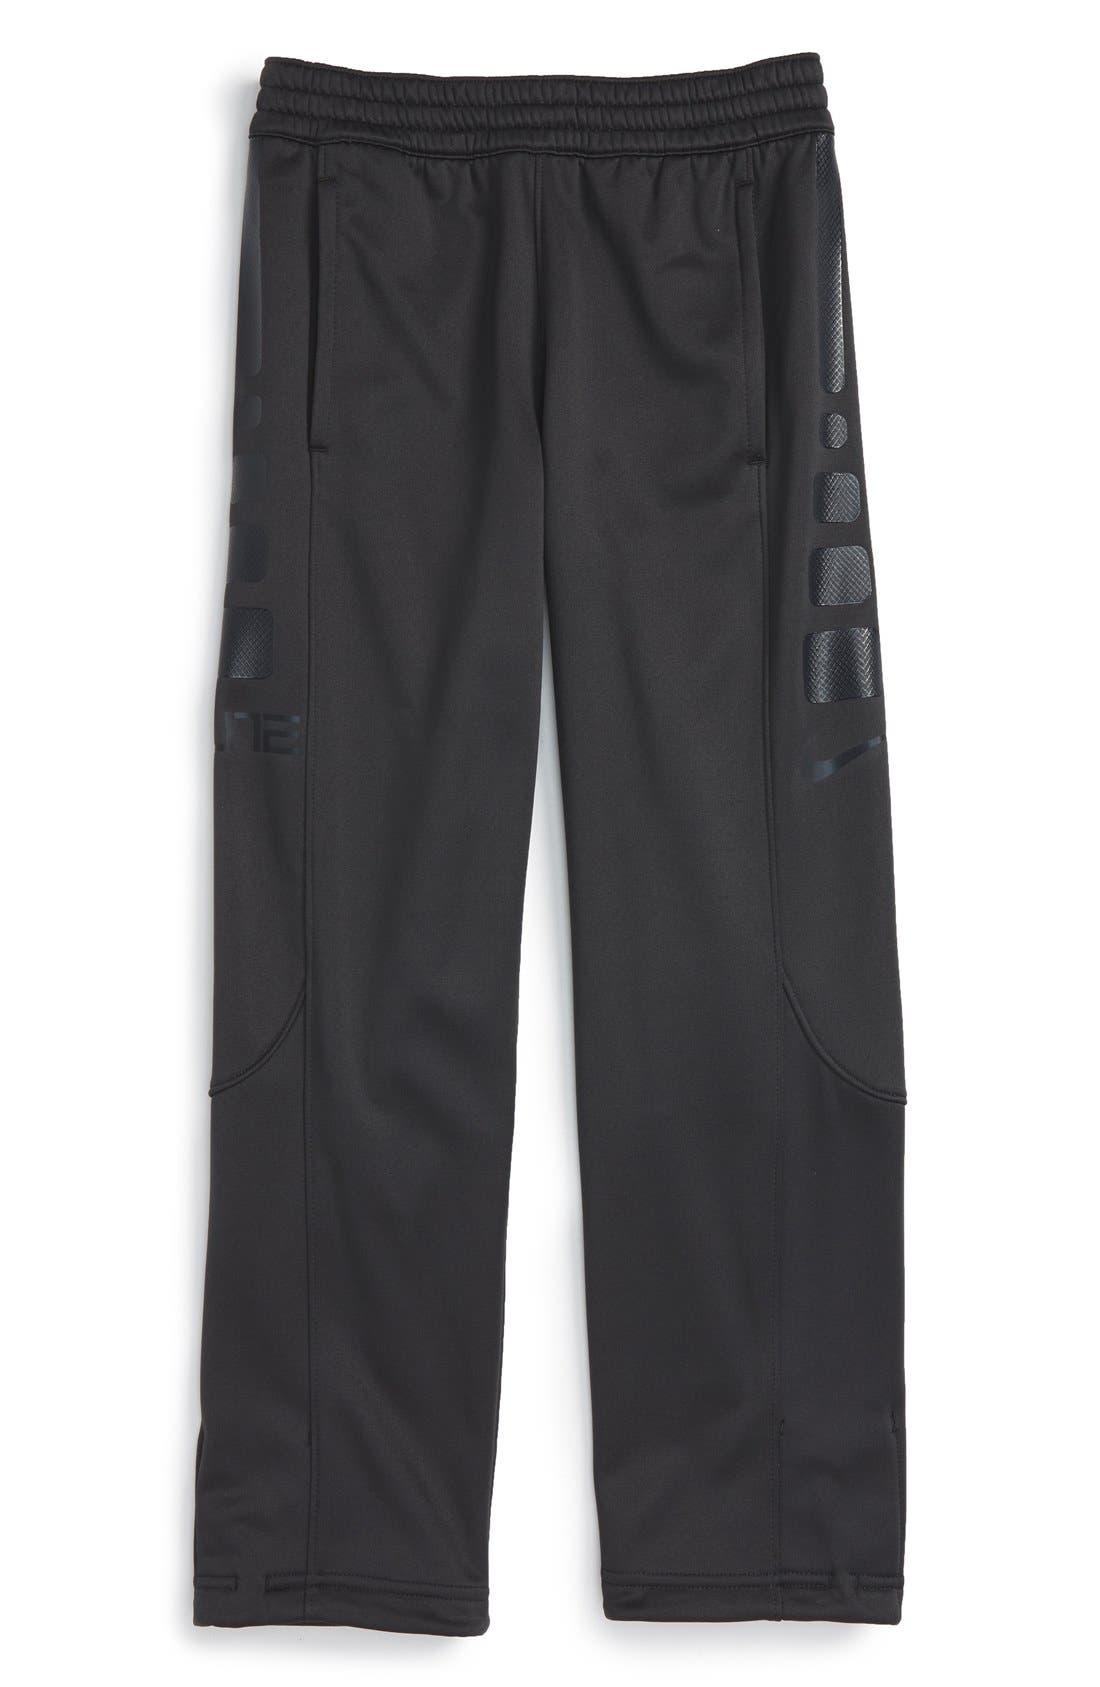 'Elite' Therma-FIT Pants,                         Main,                         color, Antrhacite/ Black